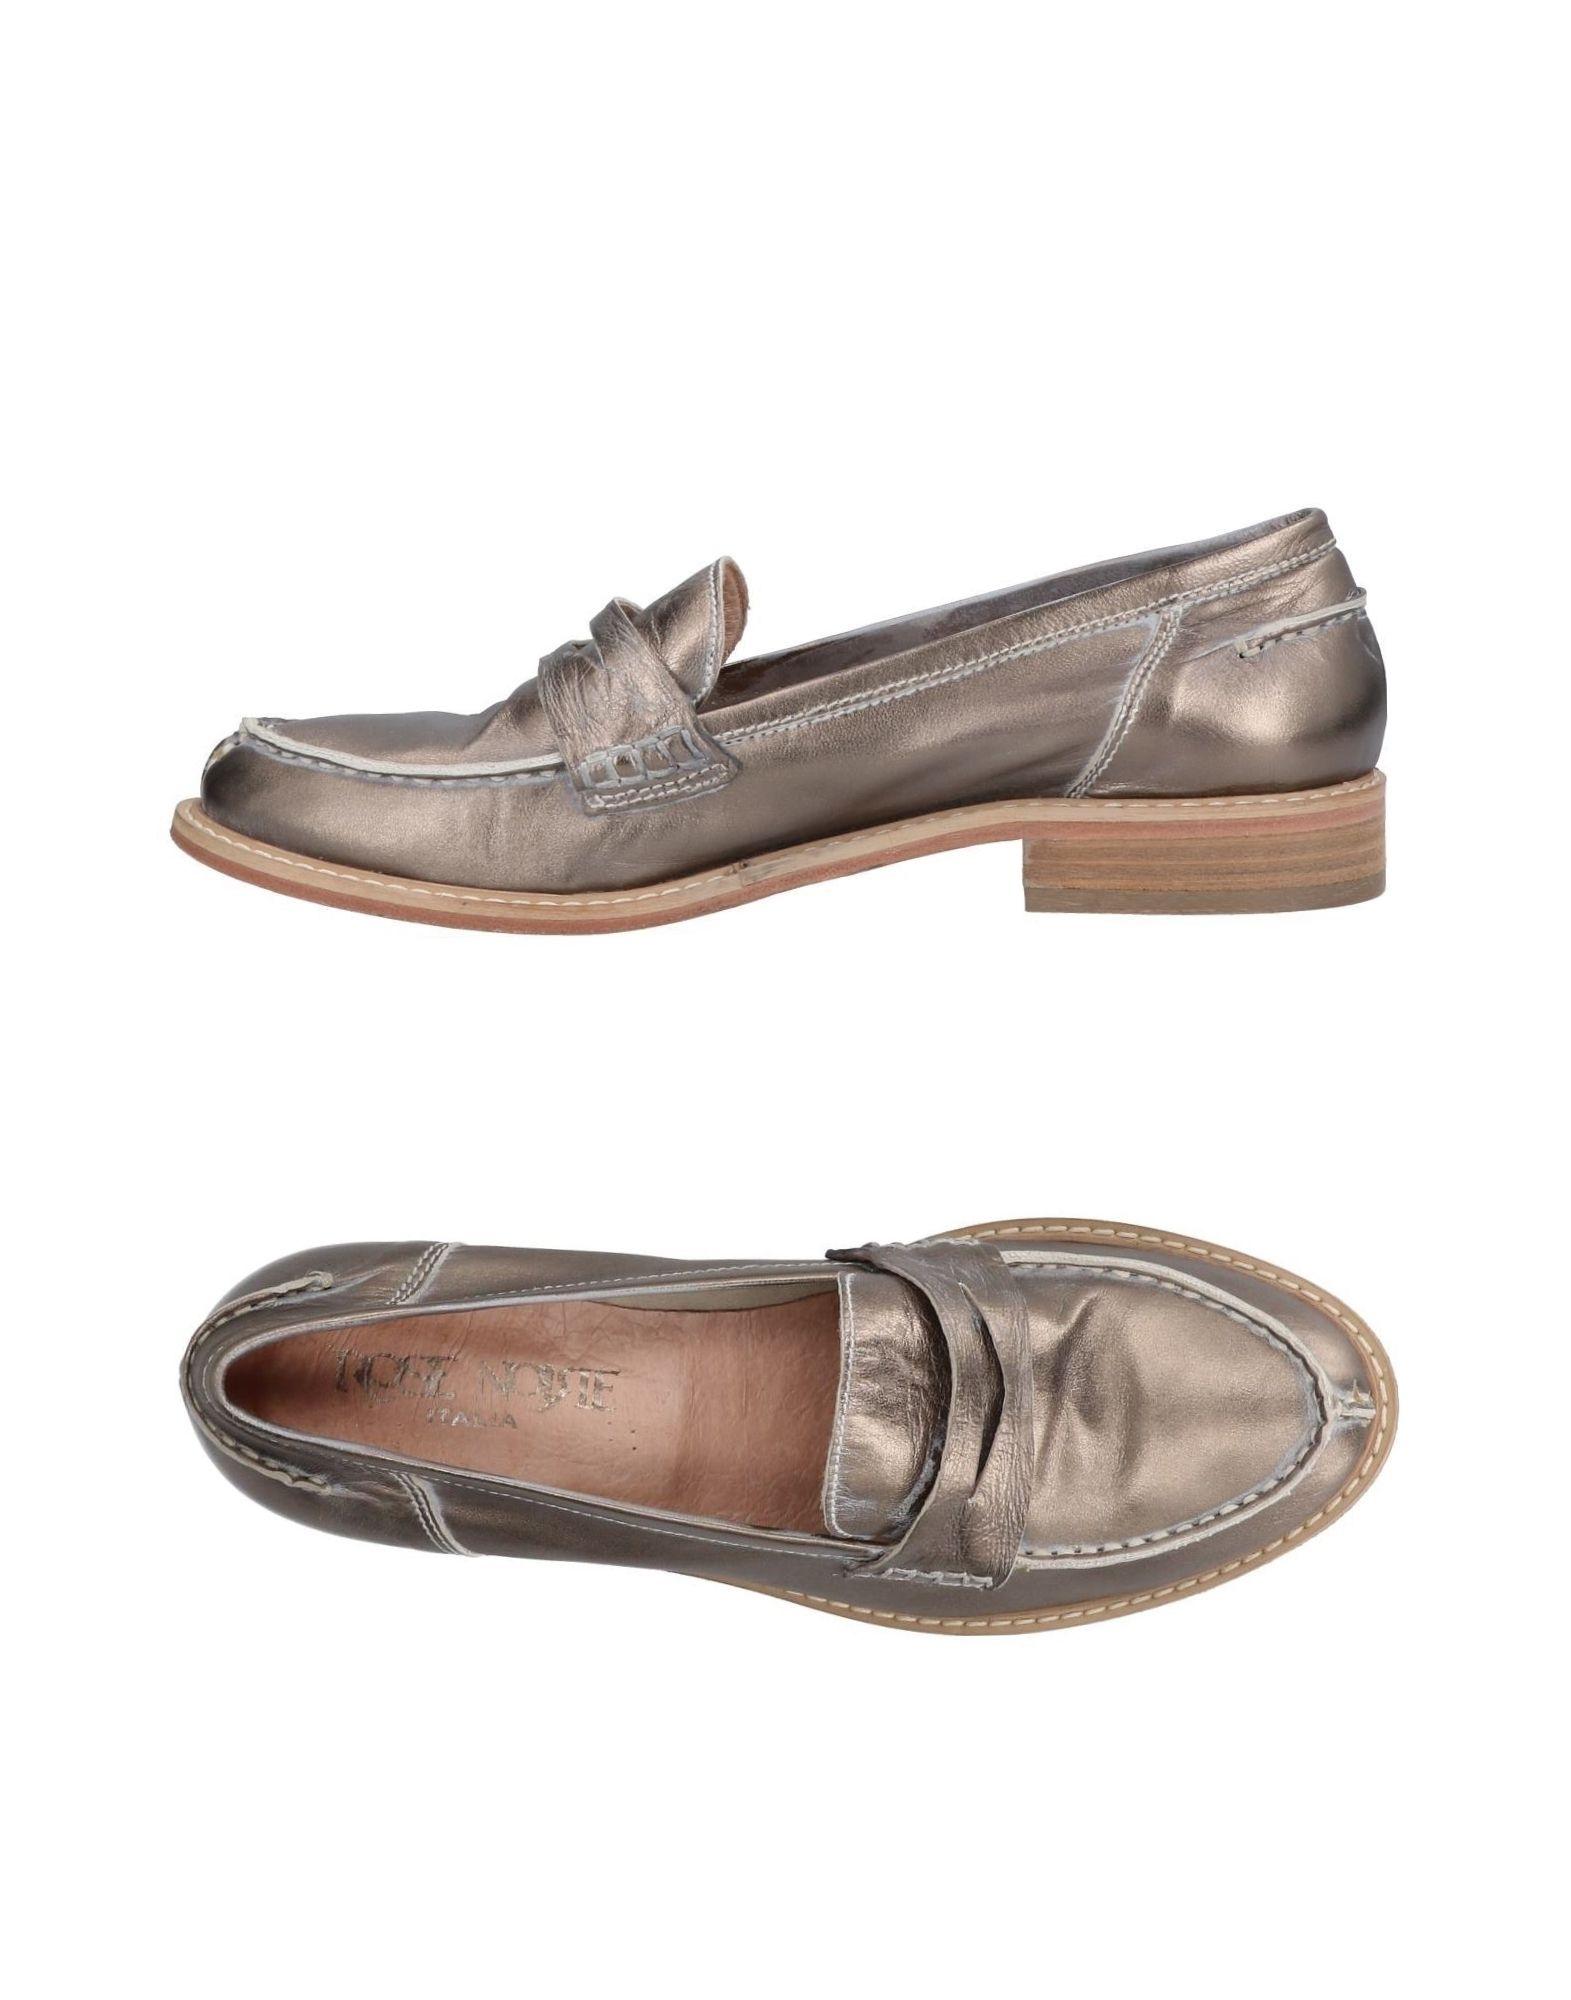 Rose Noire Mokassins Damen  11464449OV Gute Qualität beliebte Schuhe